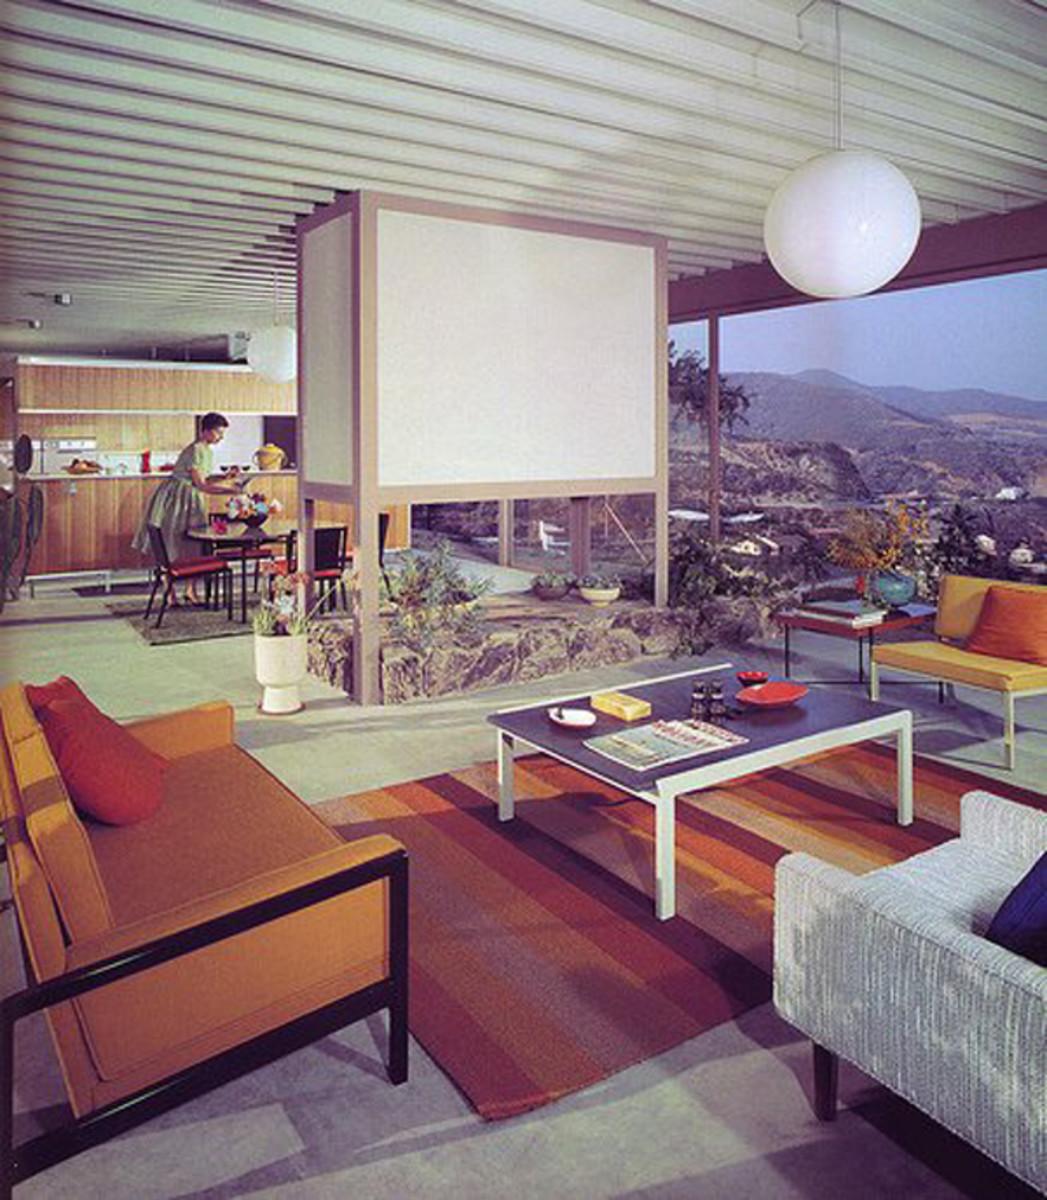 Mid-century modern interior residential design.